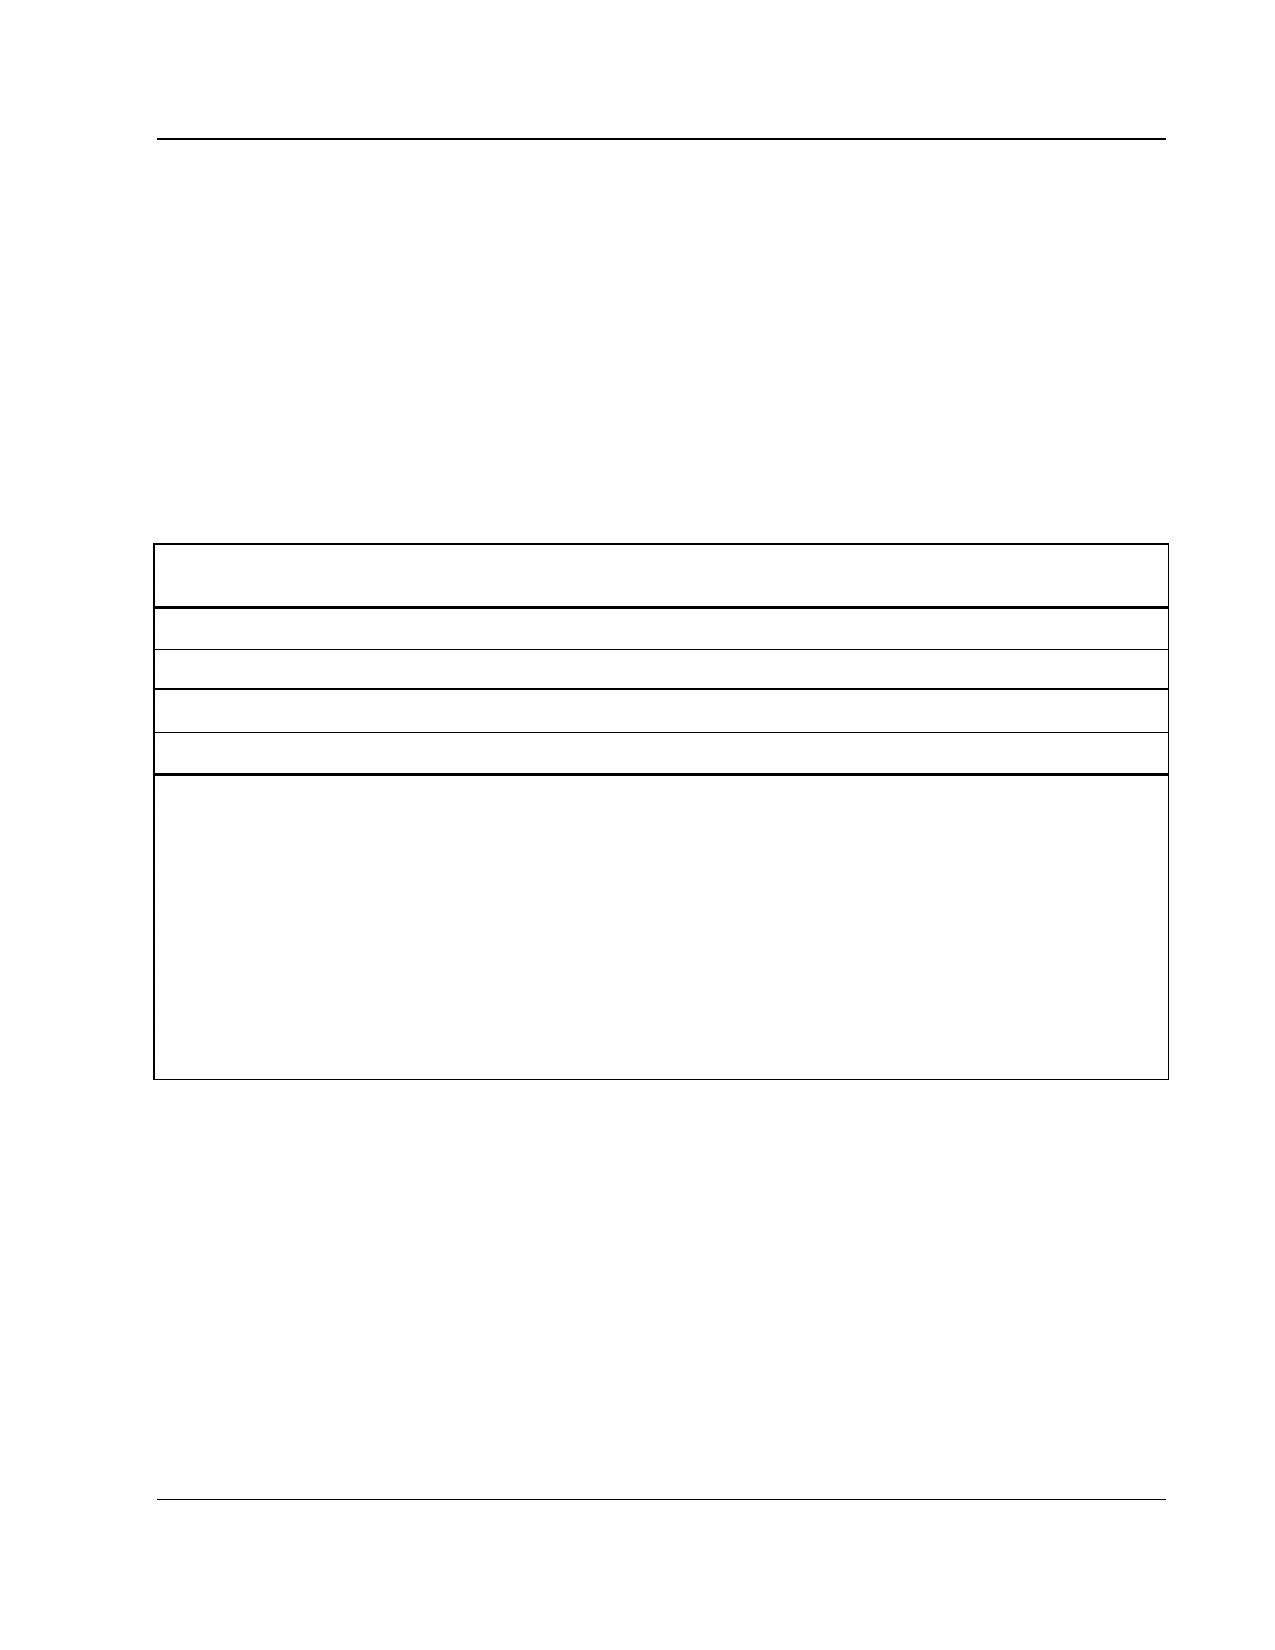 1N952 Datenblatt PDF